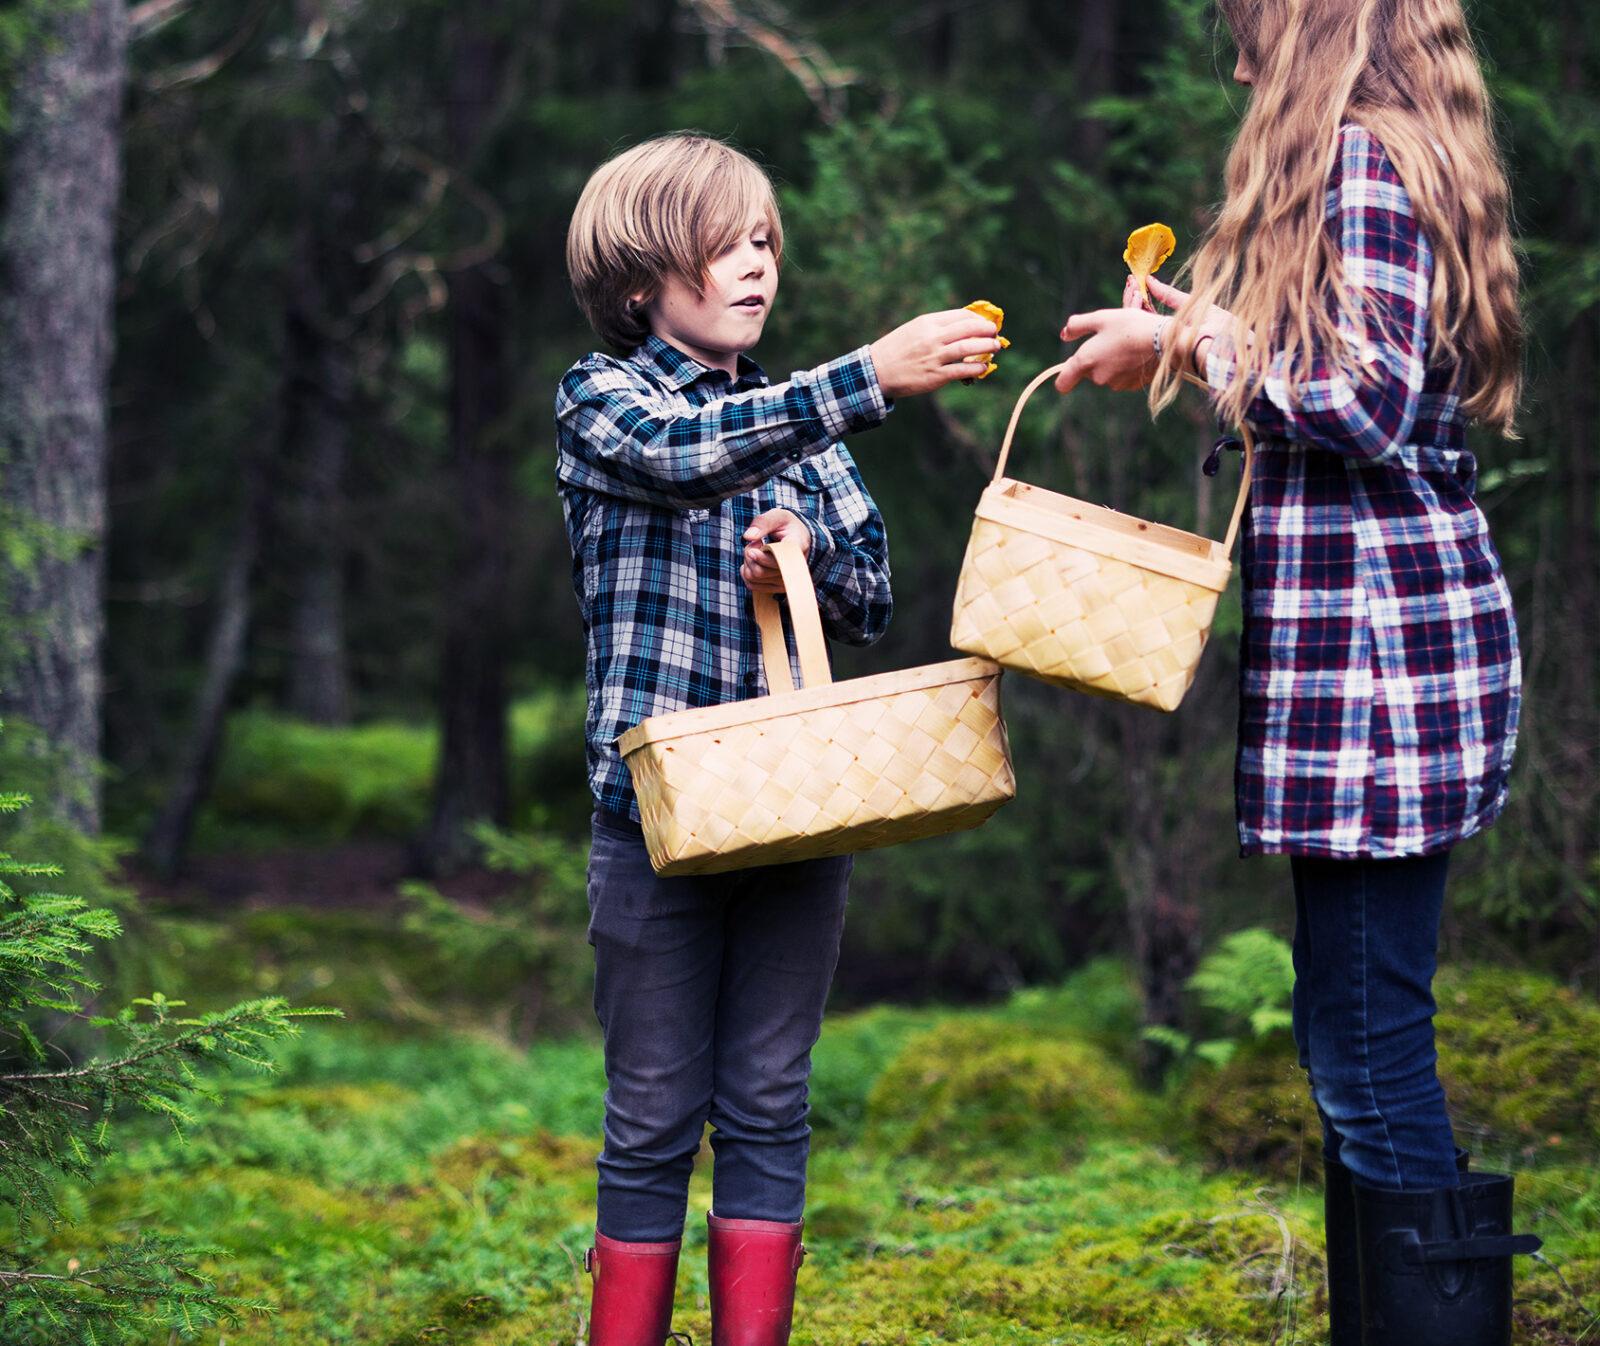 barn, skog, svamp, korg, allemansrätten